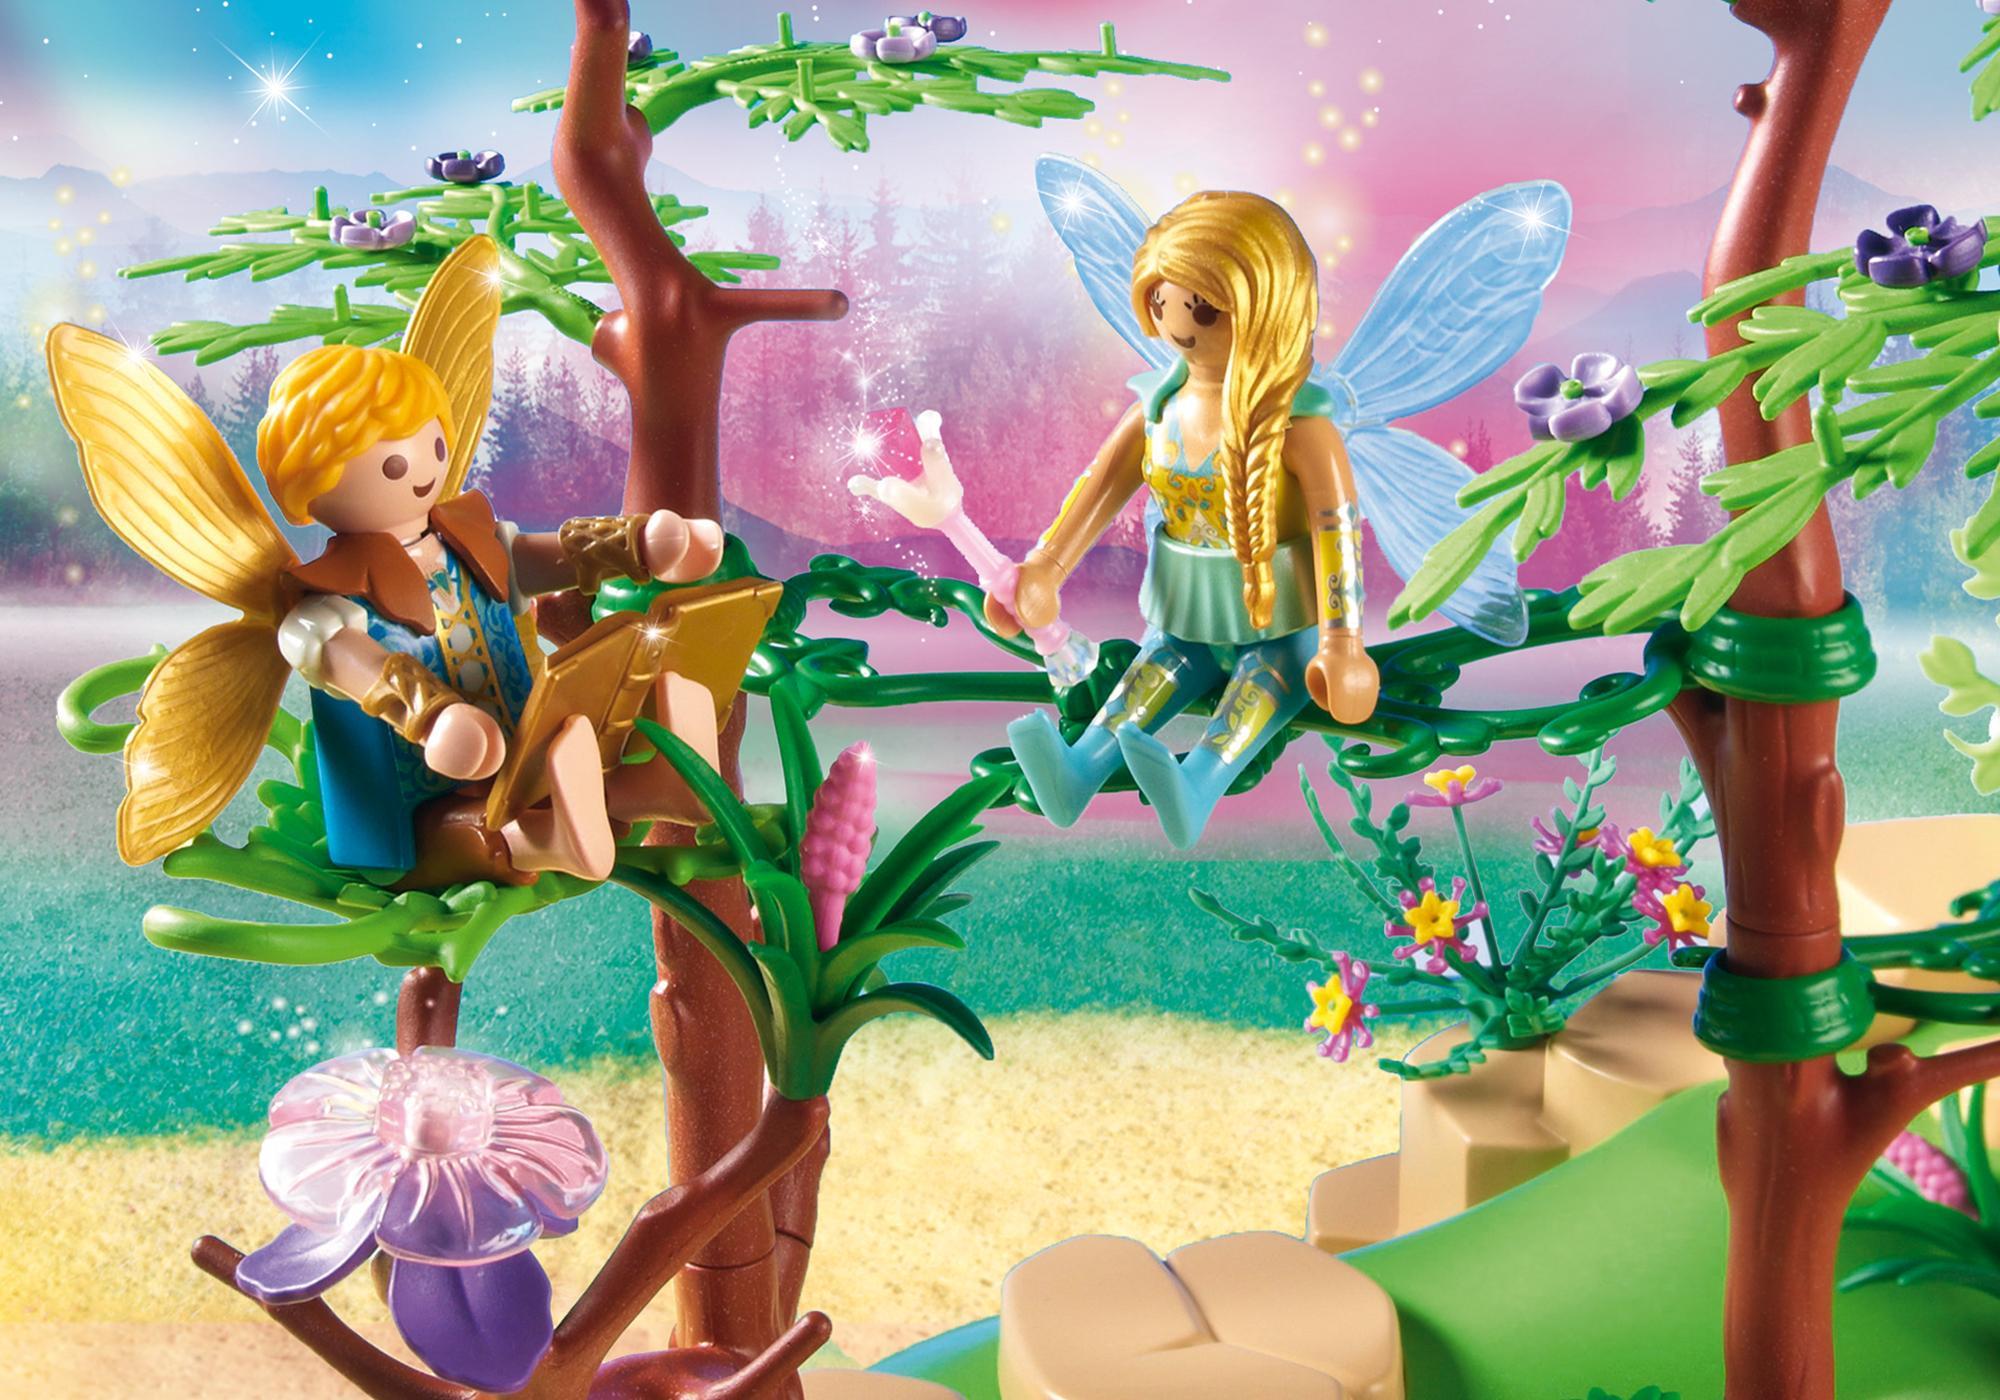 http://media.playmobil.com/i/playmobil/9132_product_extra1/Magical Fairy Forest